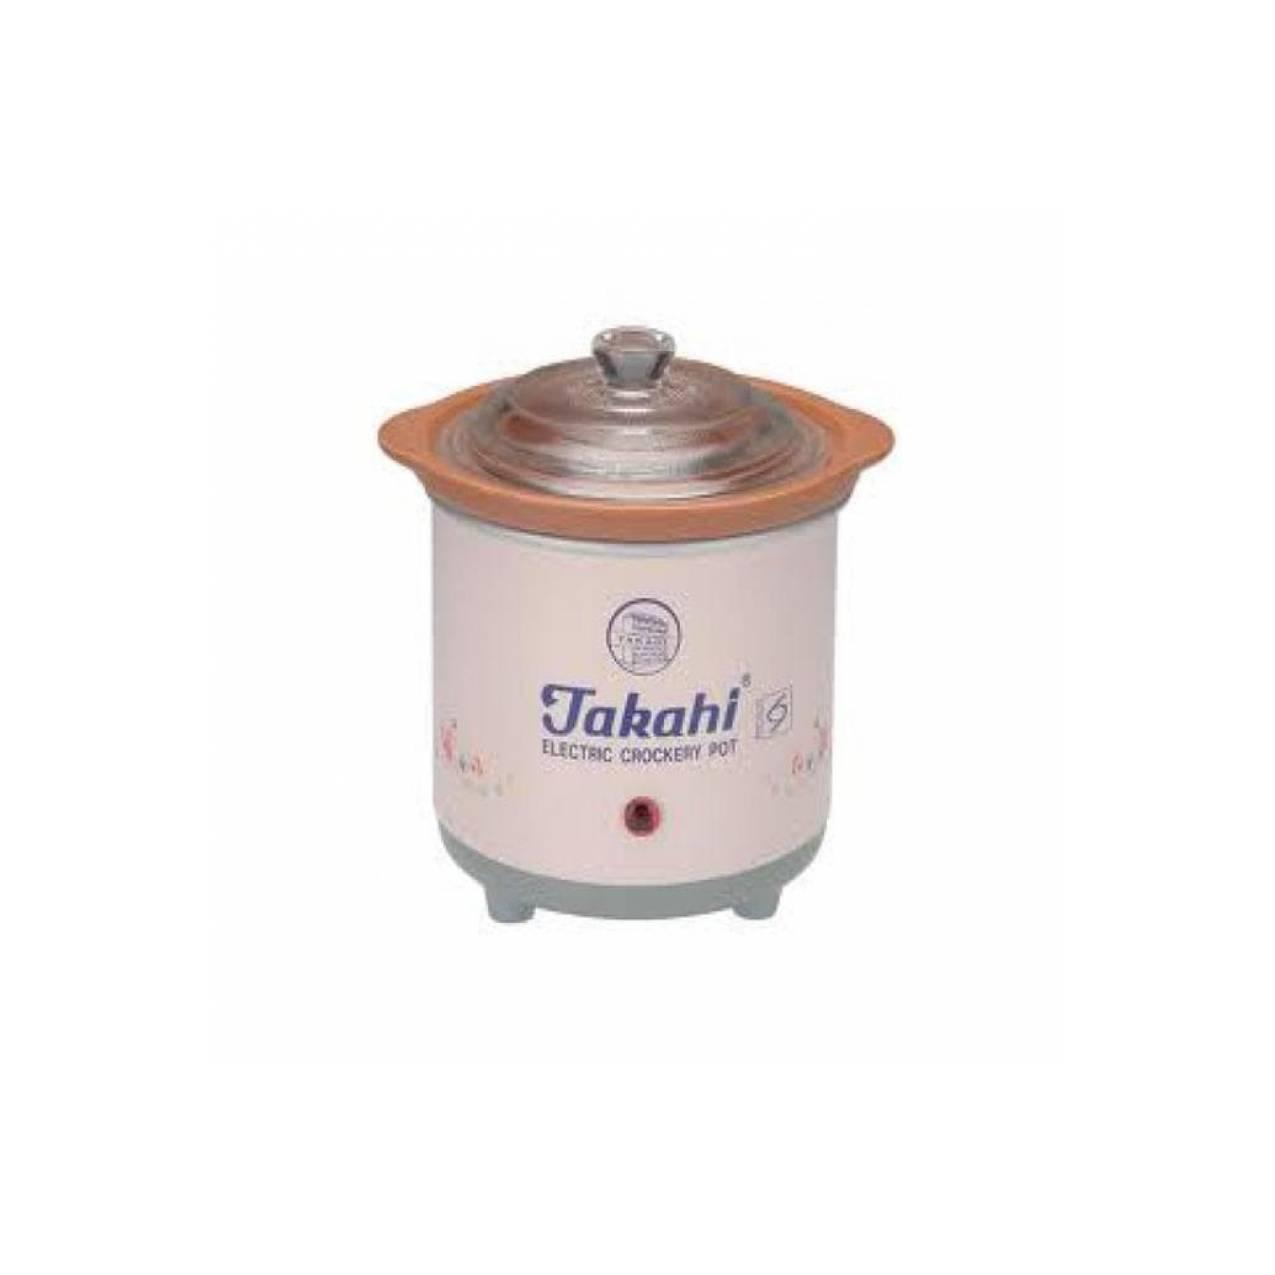 Buy Sell Cheapest Promo Mini Cooker Best Quality Product Deals Miyako Mcm 609 Magic Com 06 Liter Warm And Cook Dijual Takahi Slow 07 Litre Panci Keramik Steamer